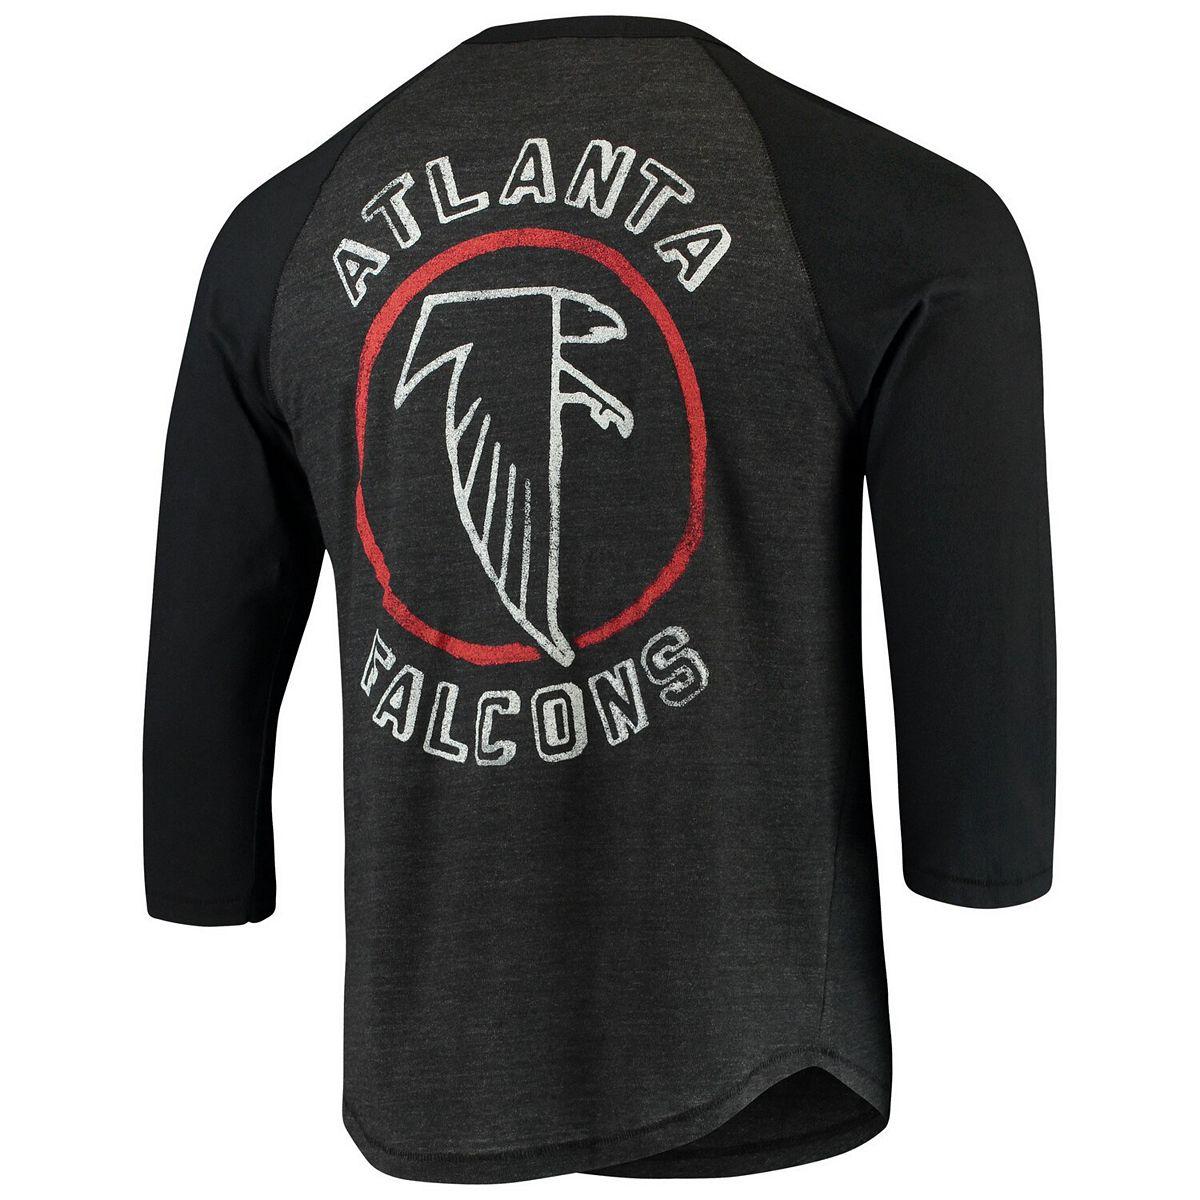 Men's Junk Food Heathered Black/Black Atlanta Falcons Contrast 3/4-Sleeve Raglan Tri-Blend T-Shirt oW7Ja